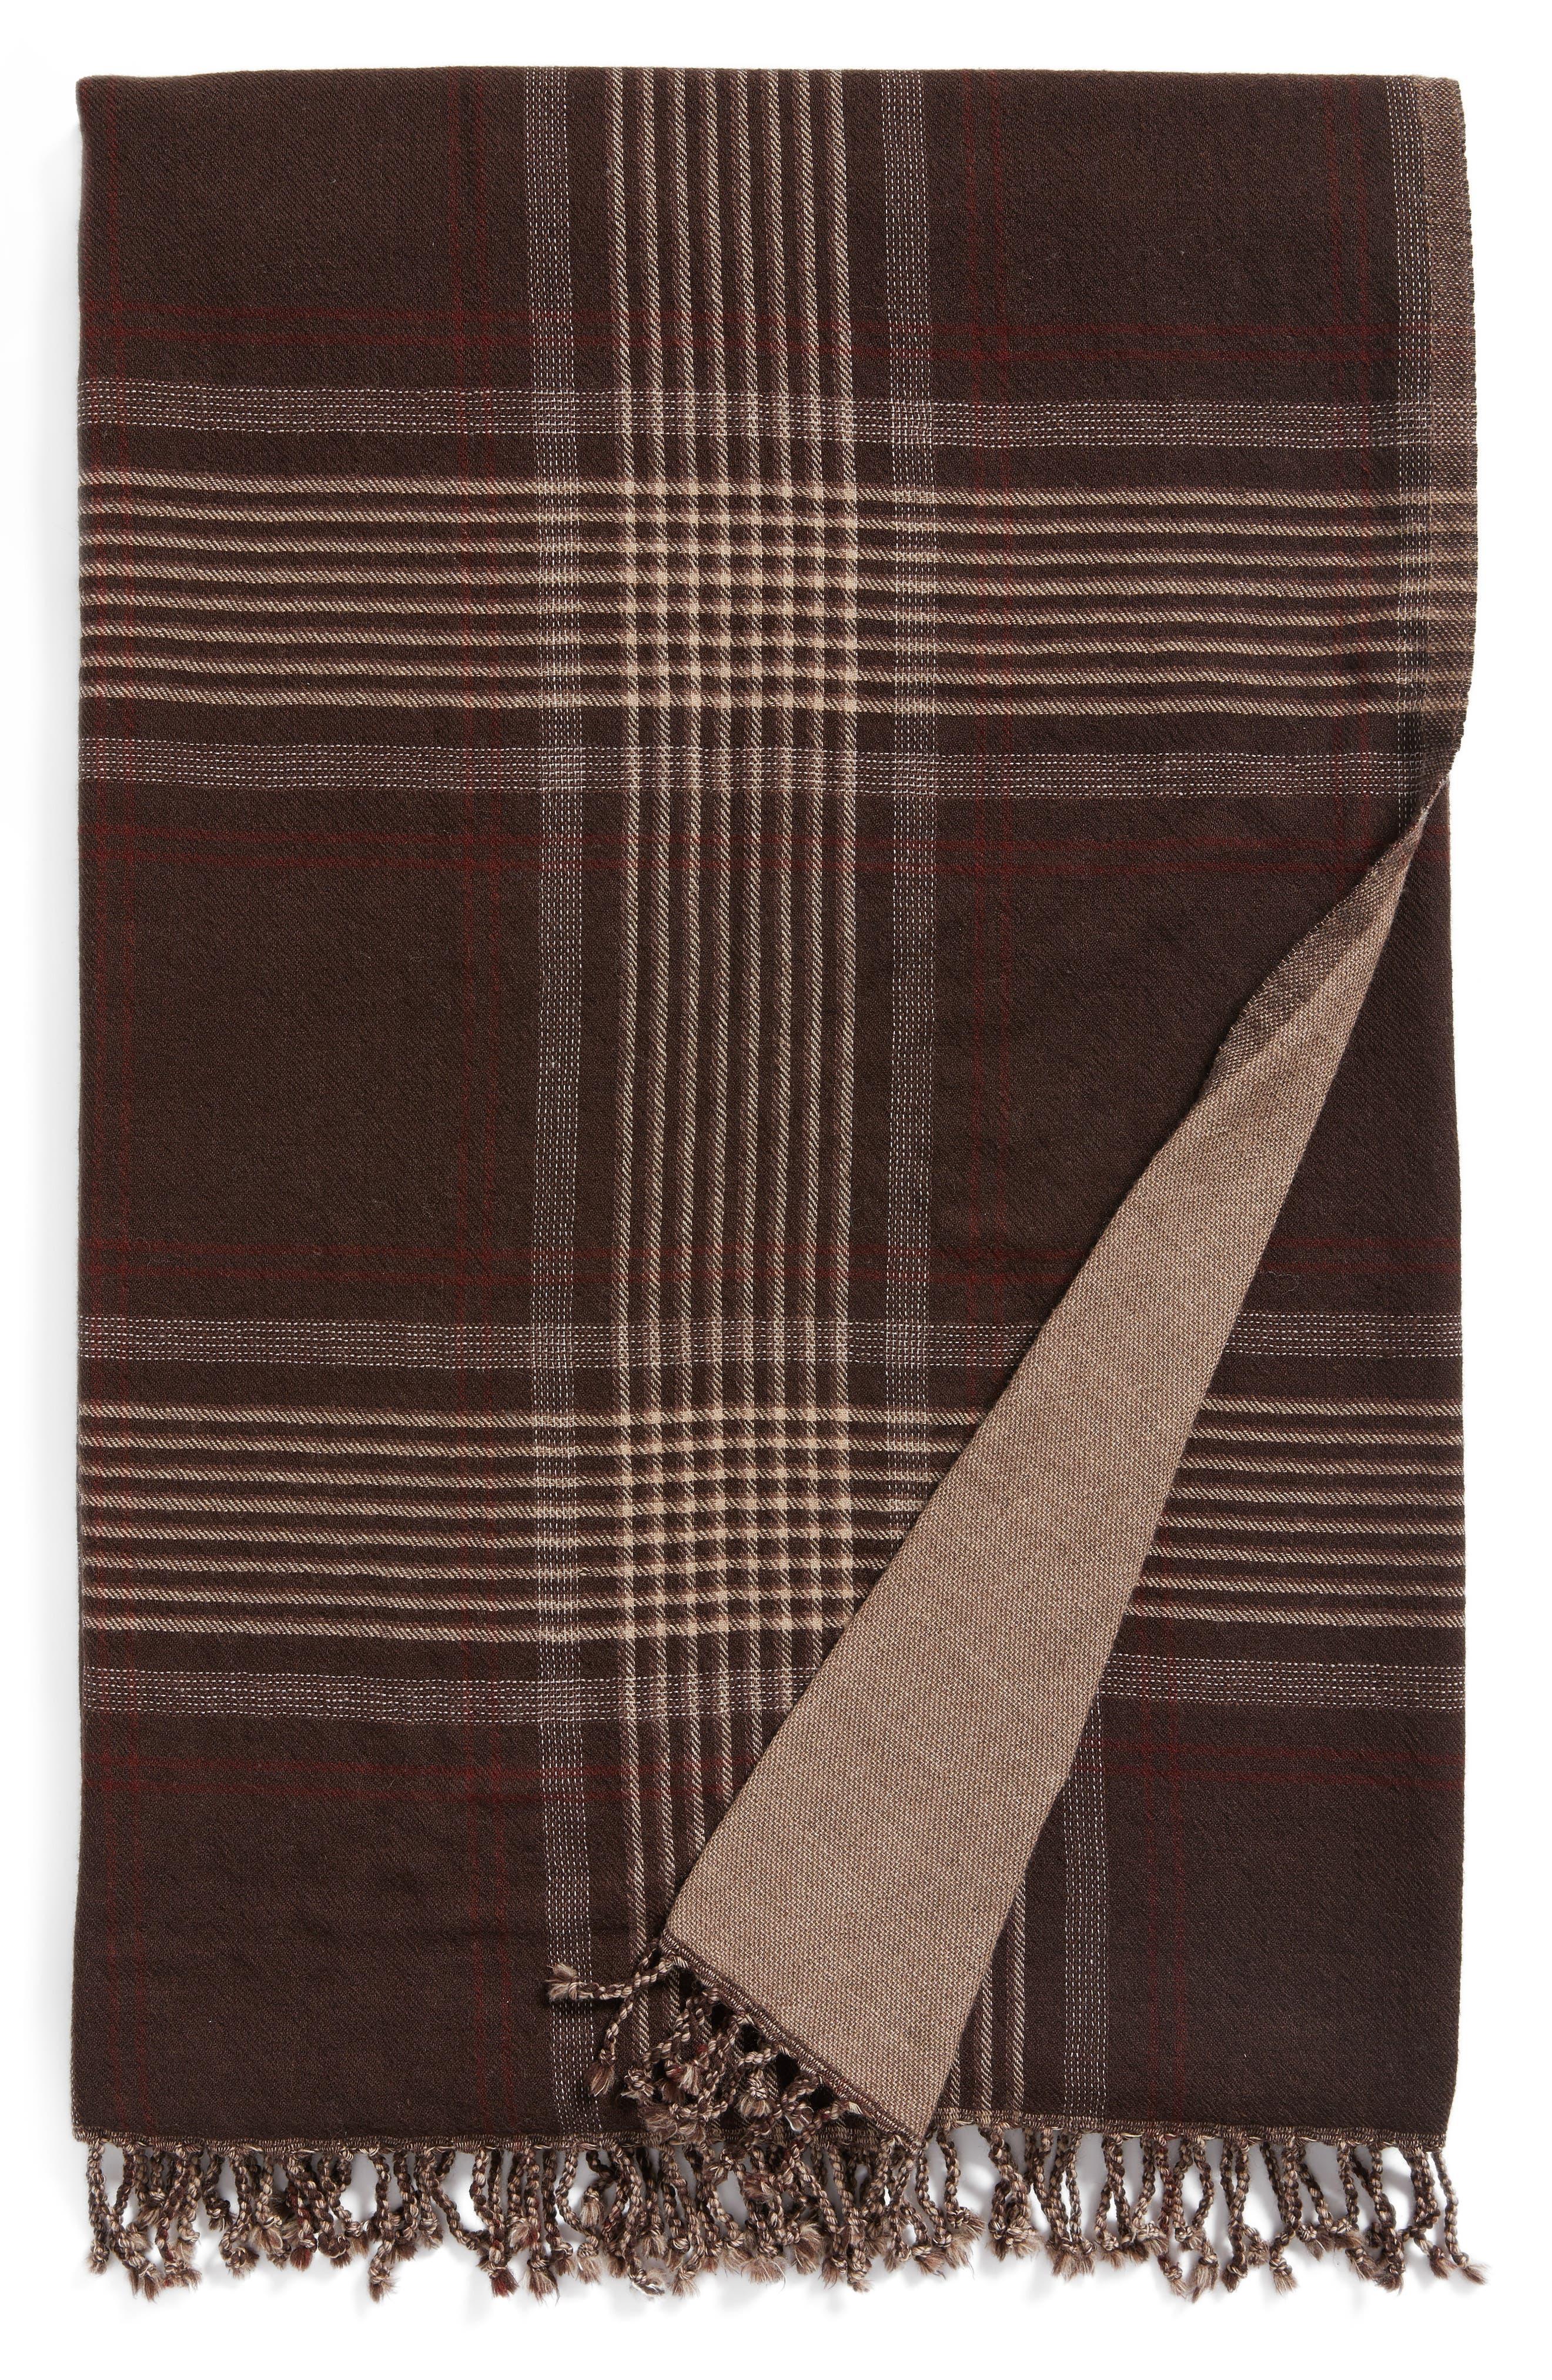 Plaid Double Face Merino Wool Throw,                             Main thumbnail 1, color,                             BROWN SHADOW STRIPE PLAID